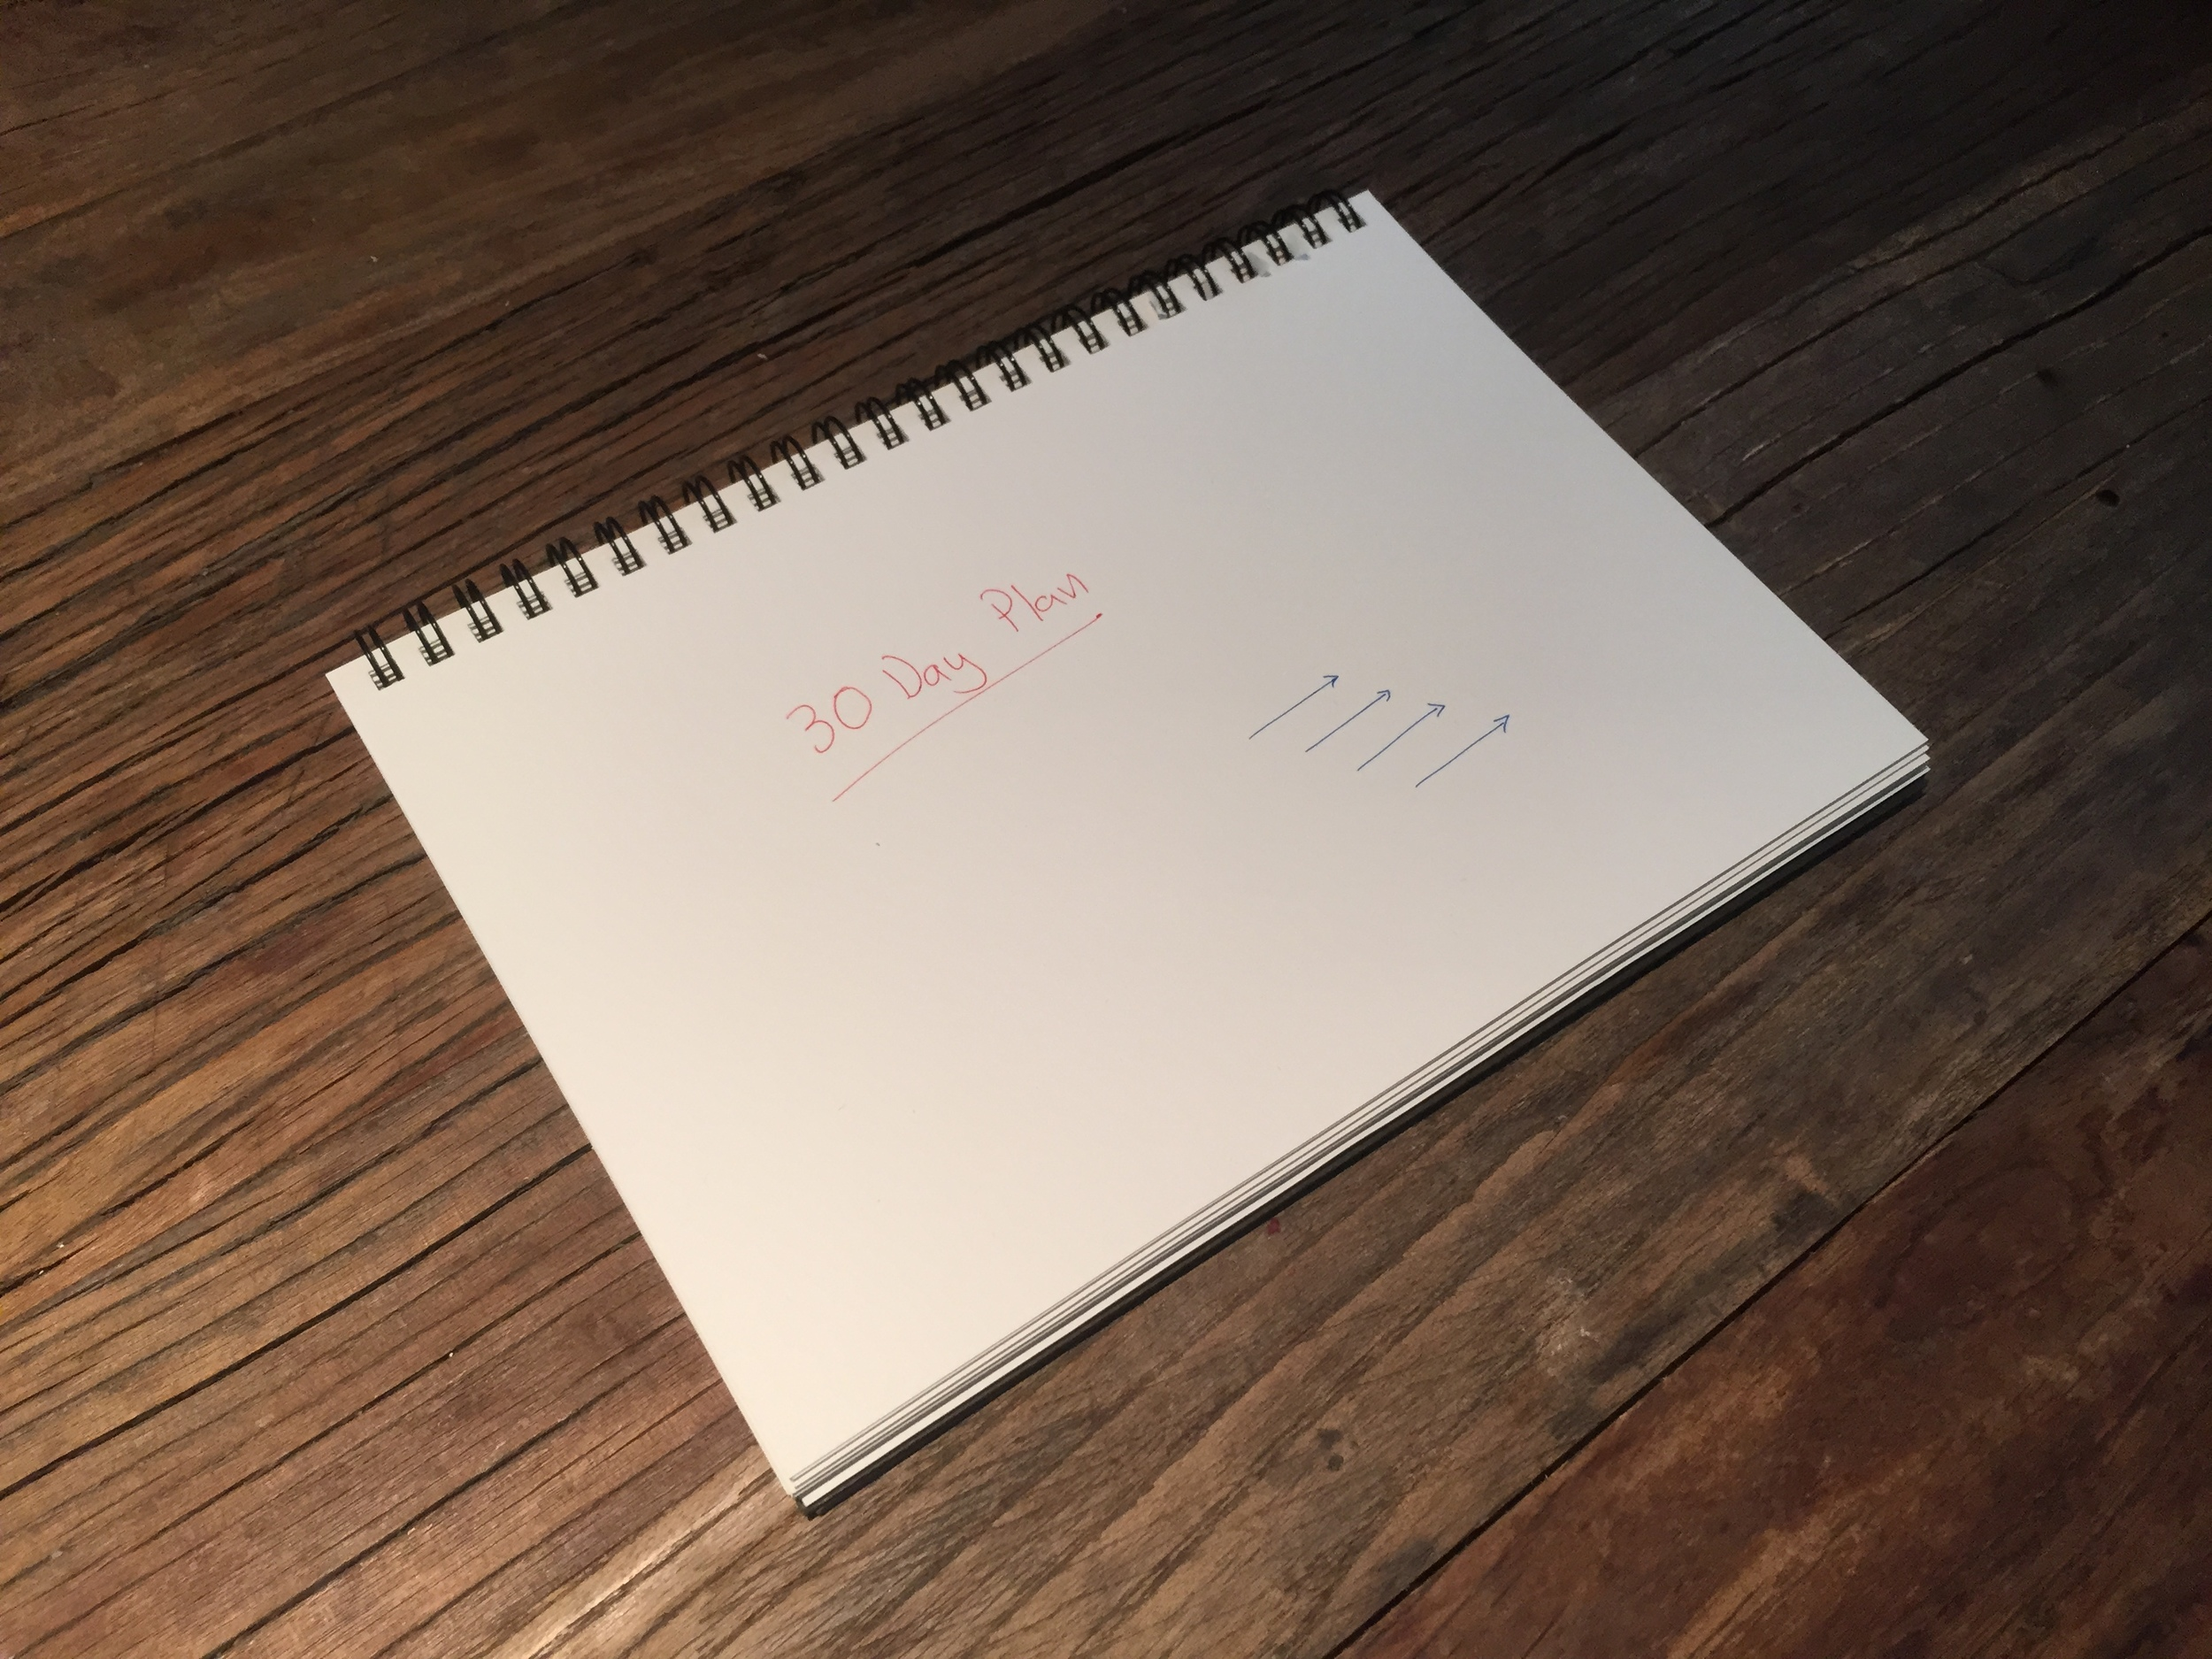 30 Day Plan Doodle Handwritten